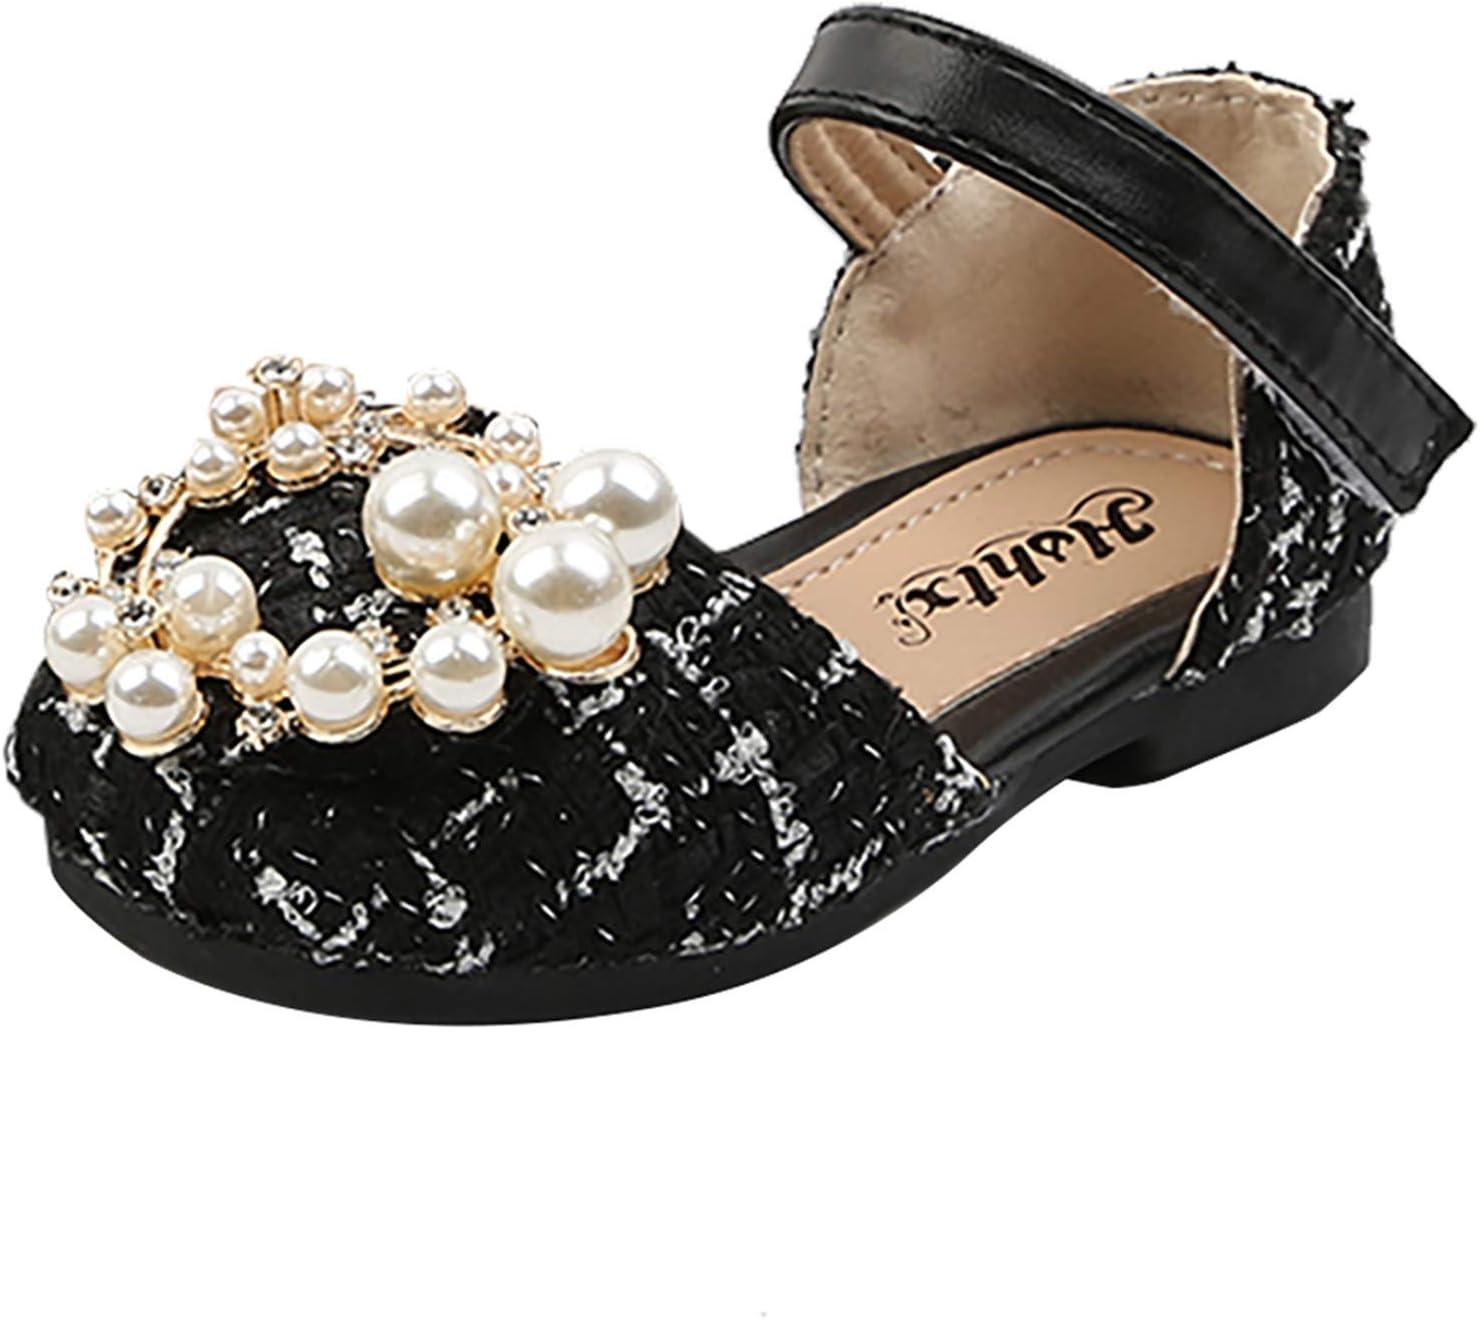 Yeslove Children Girls Fashion service Pearls Shoes Tweed Princess Overseas parallel import regular item Kids